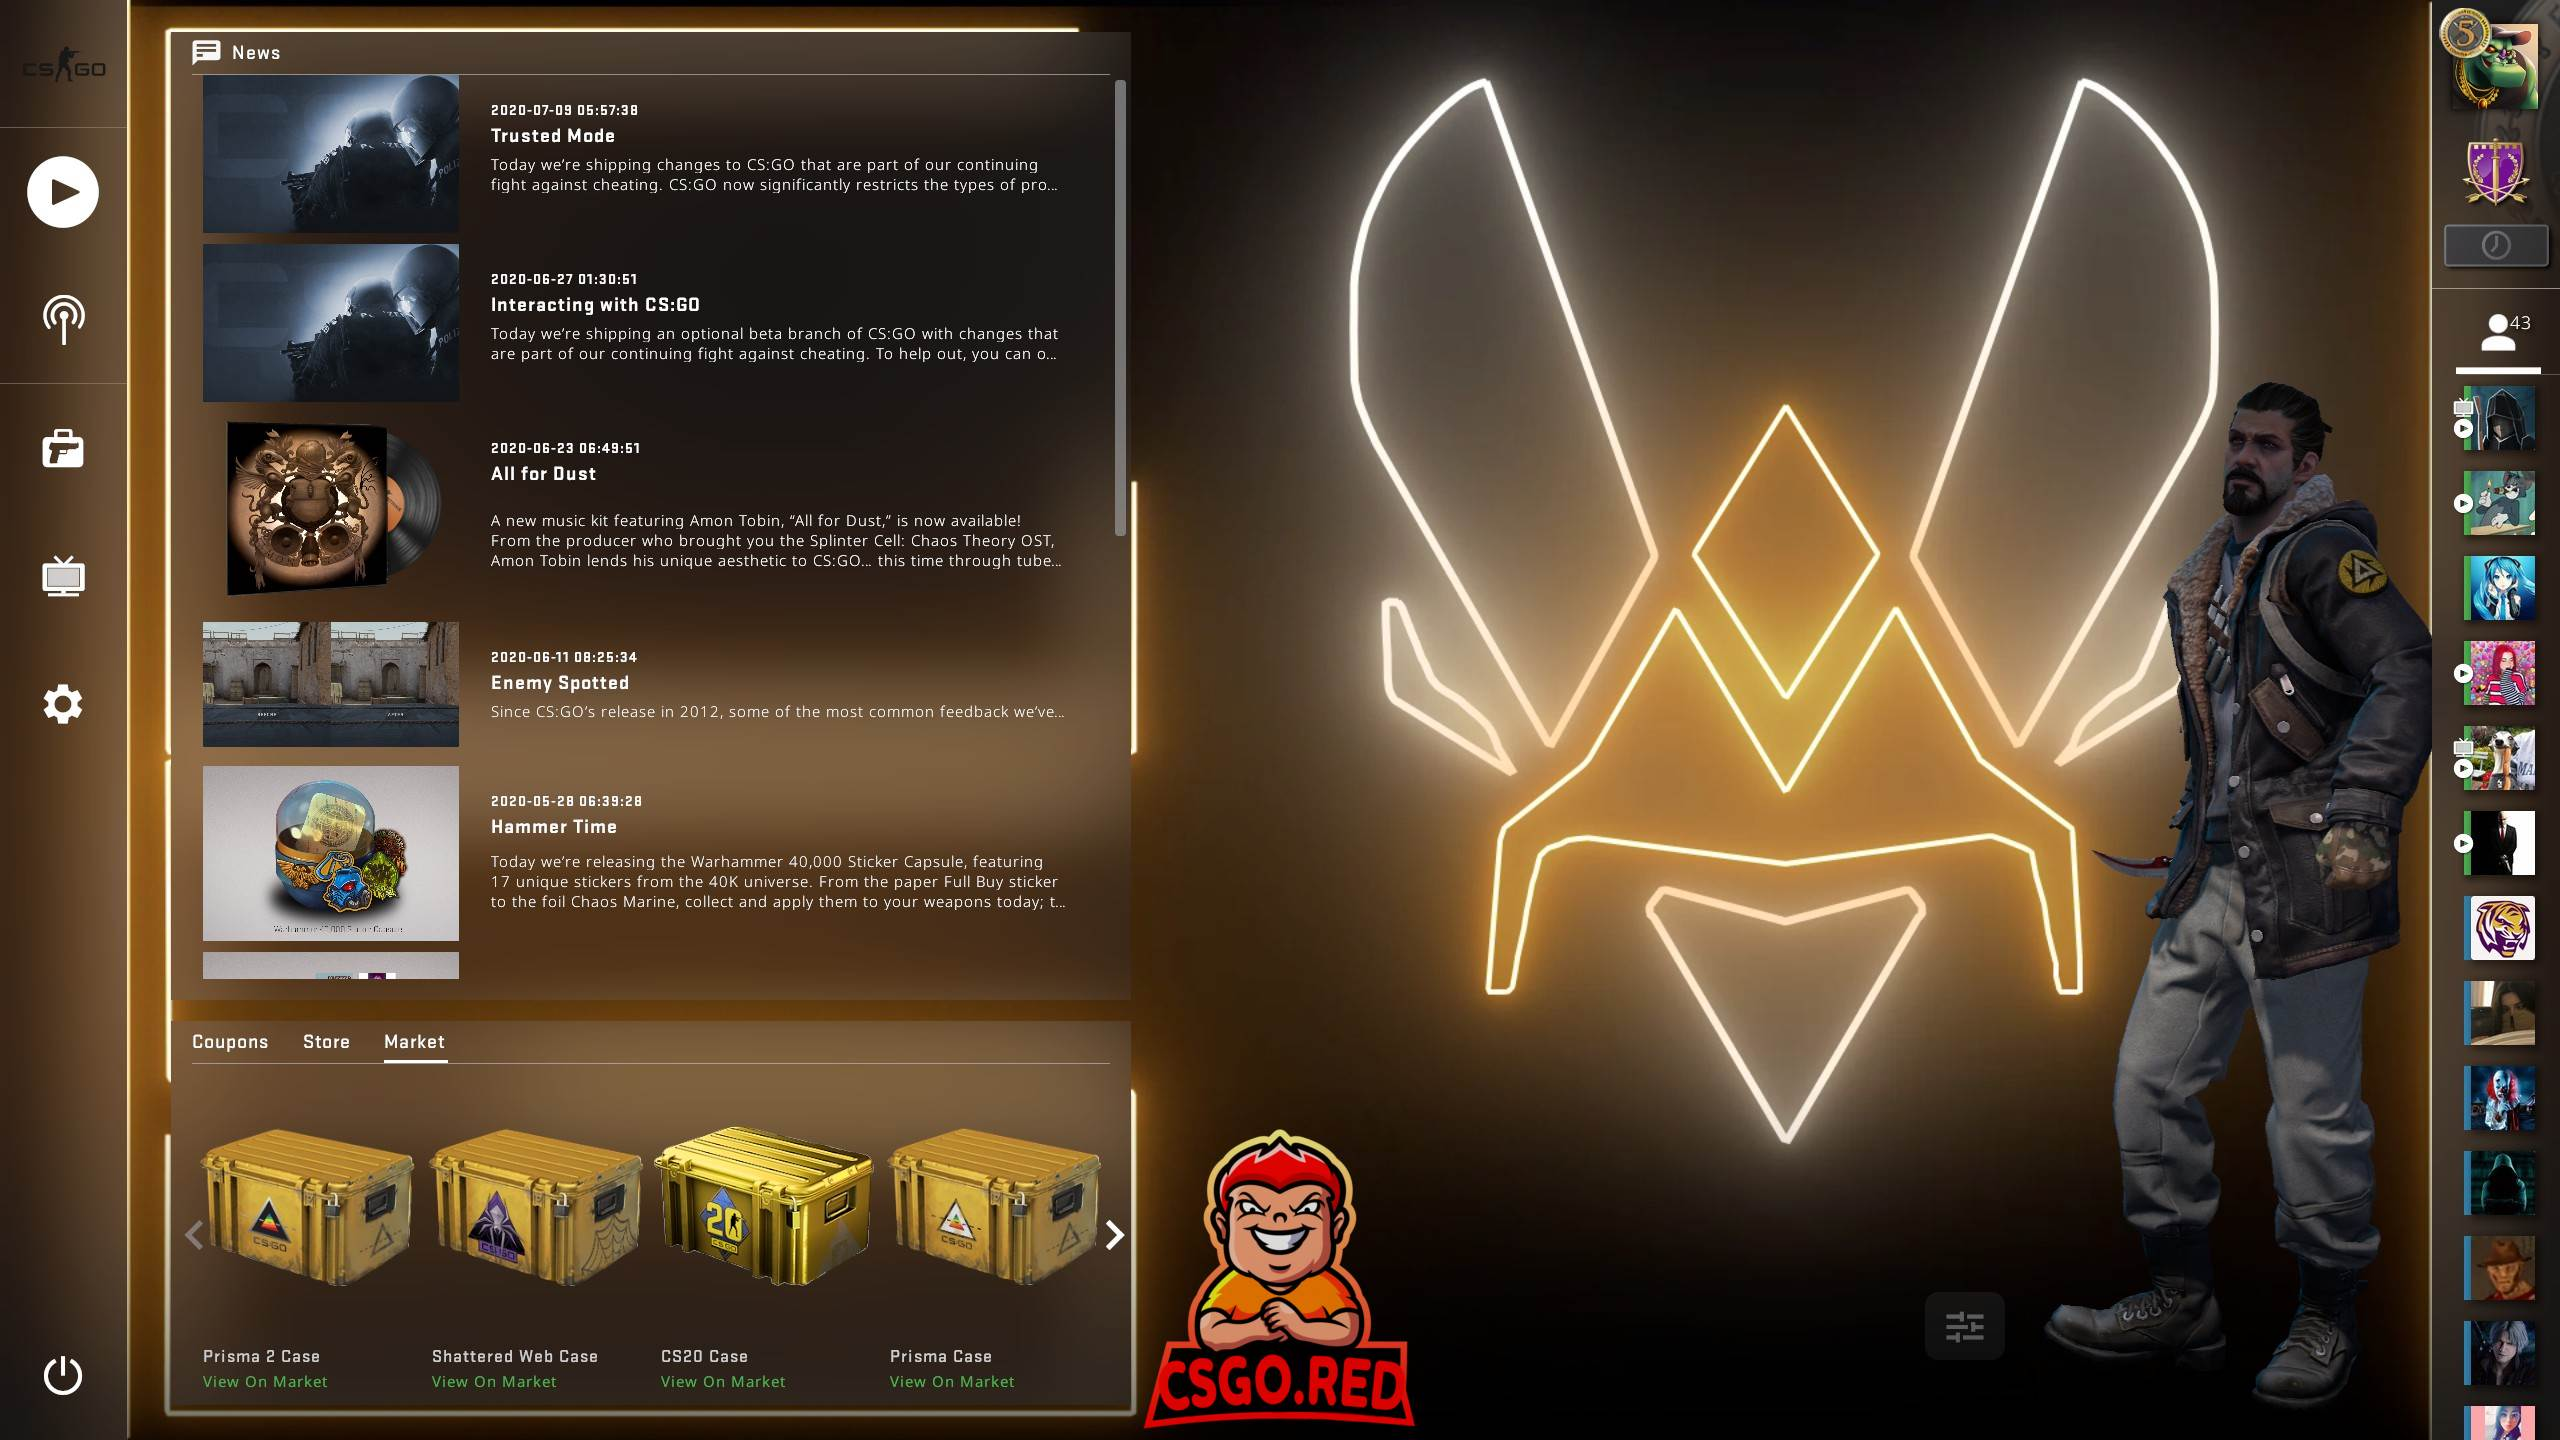 Vitality Animated Panorama UI Background